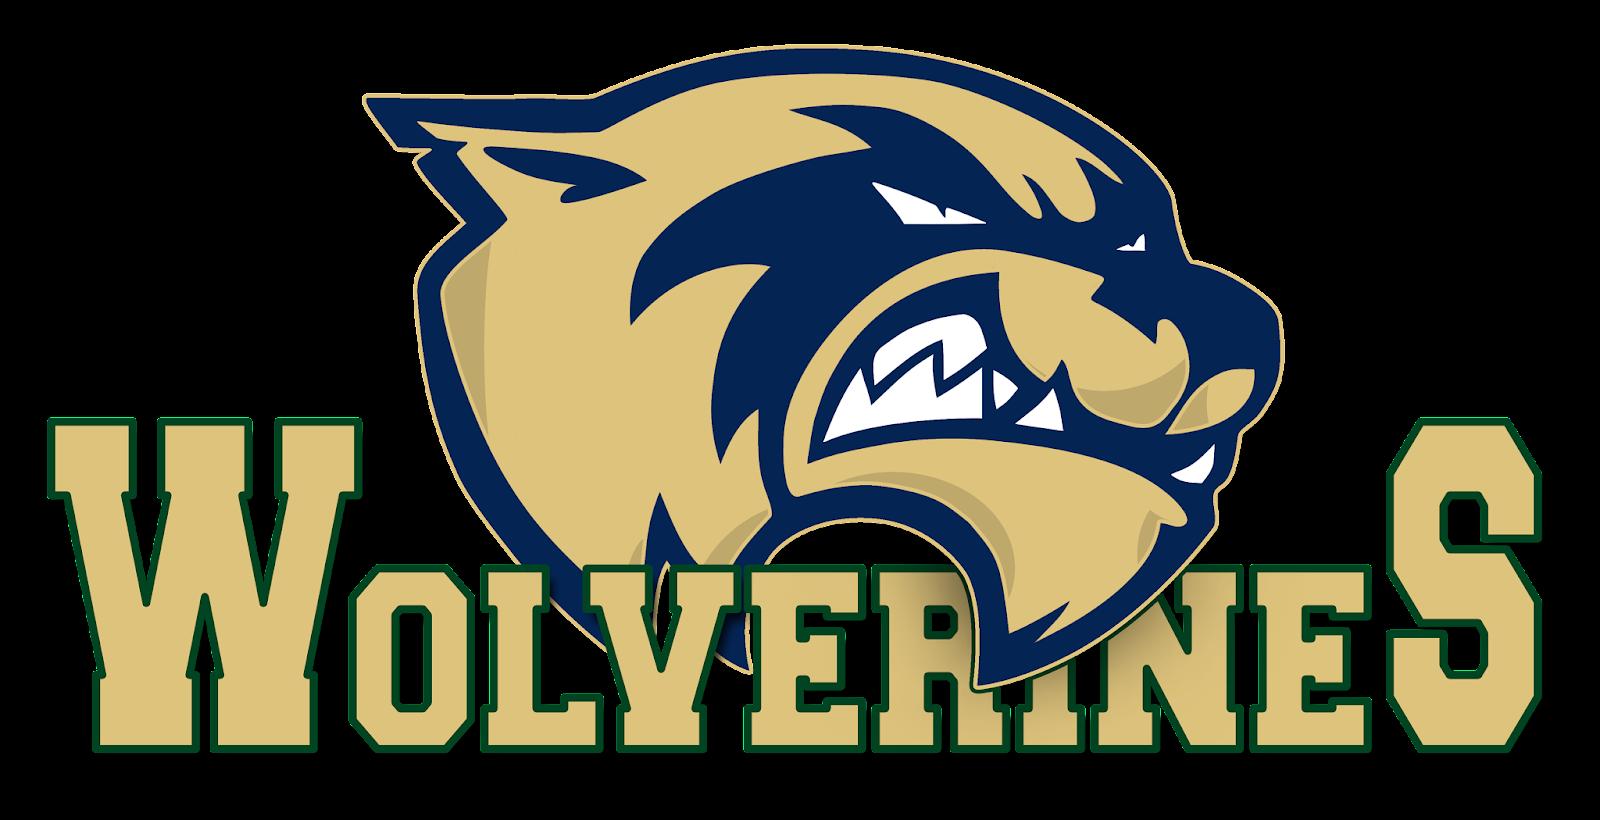 wolverine logo 2015.png